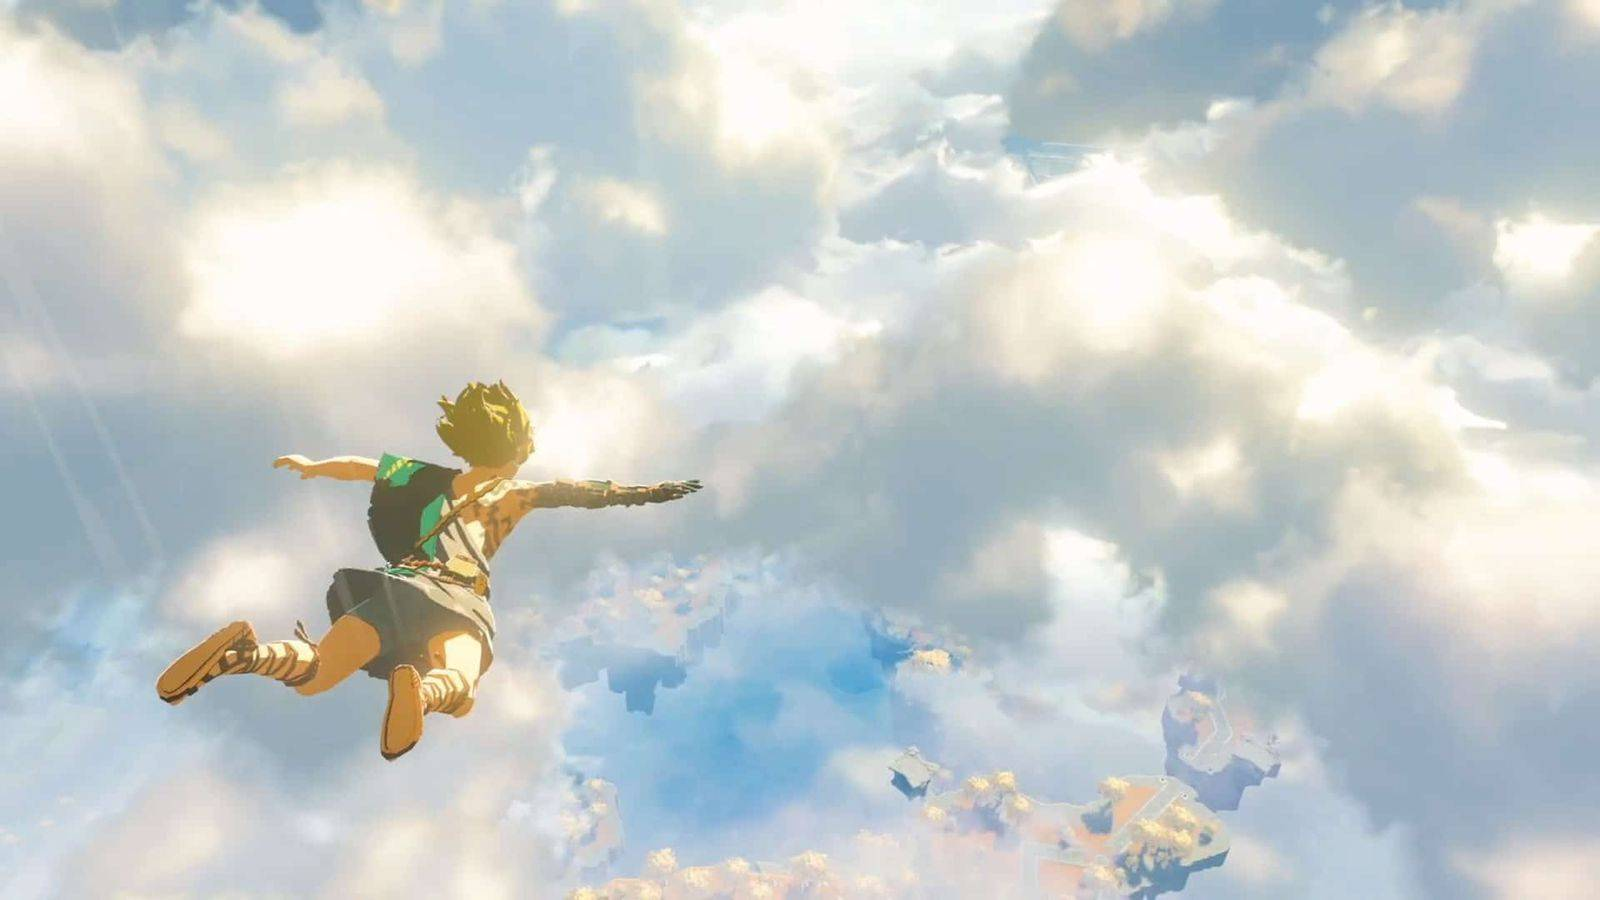 E3 2021: Se muestra un nuevo avance de The Legend of Zelda Breath of the Wild 2 4